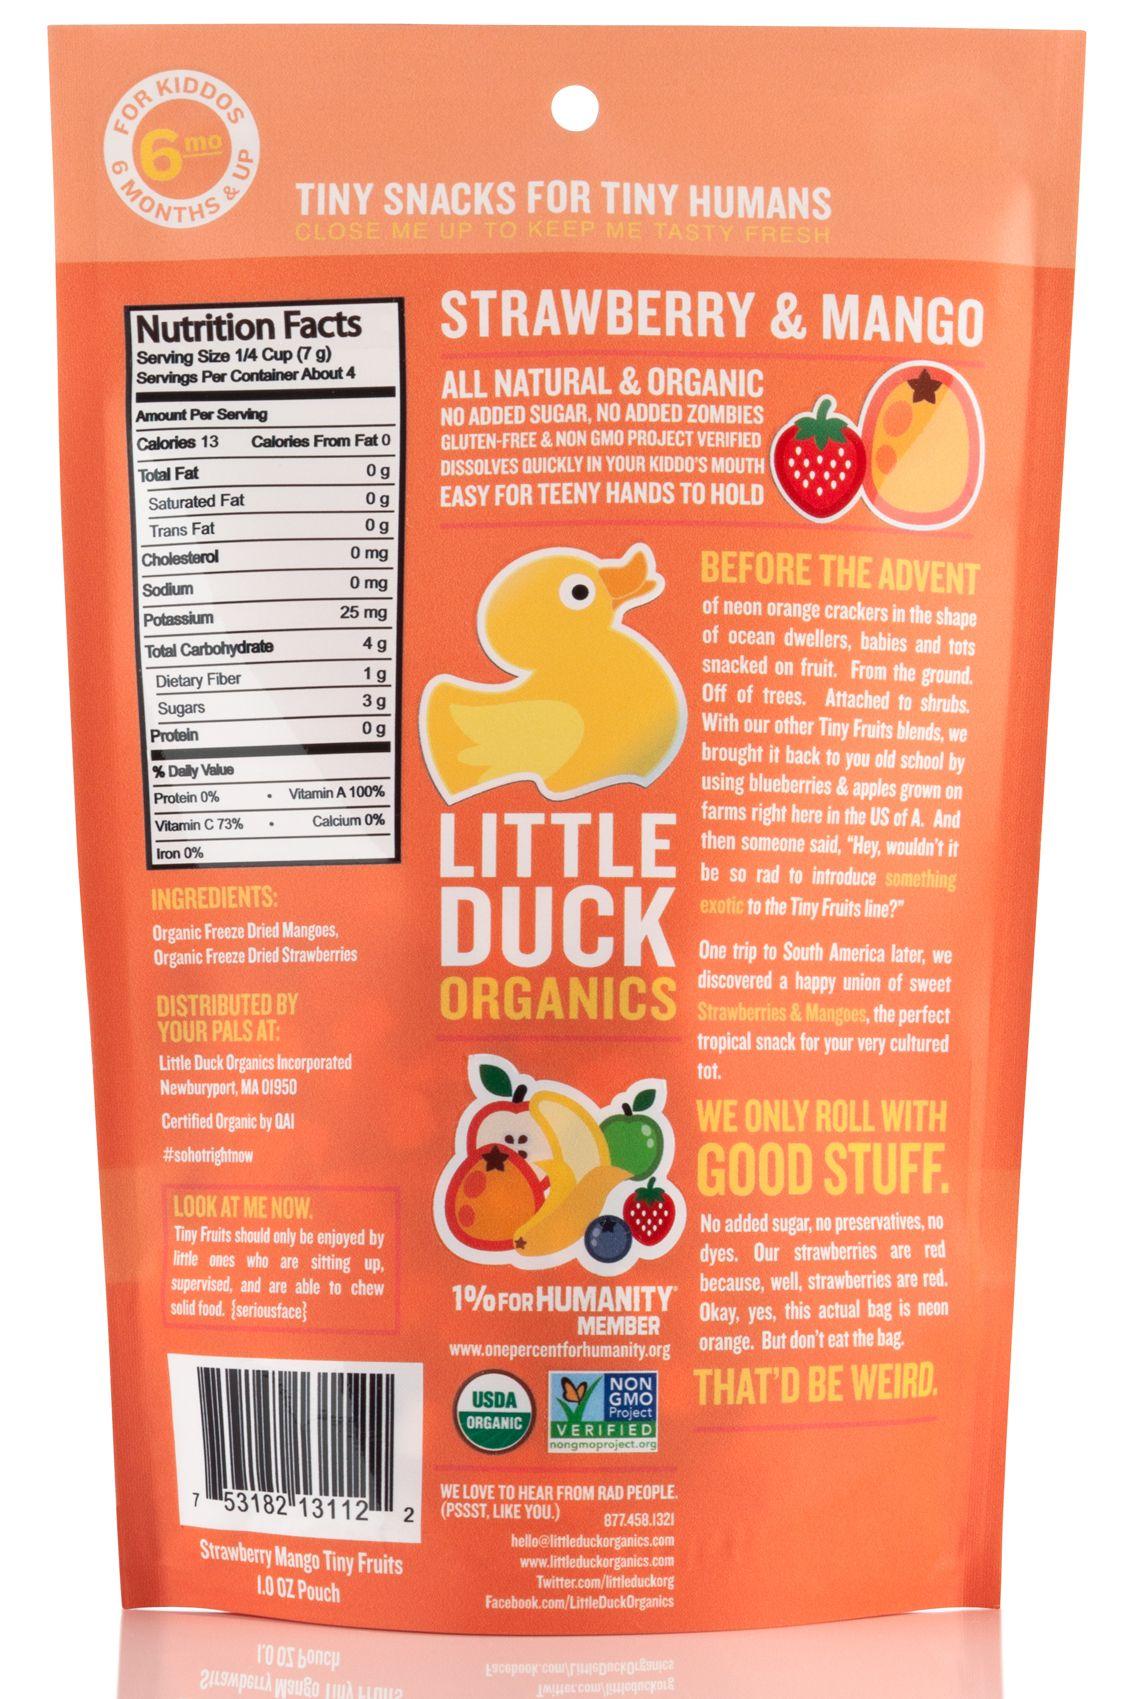 little-duck-organics-tiny-fruits-copywriting.jpeg